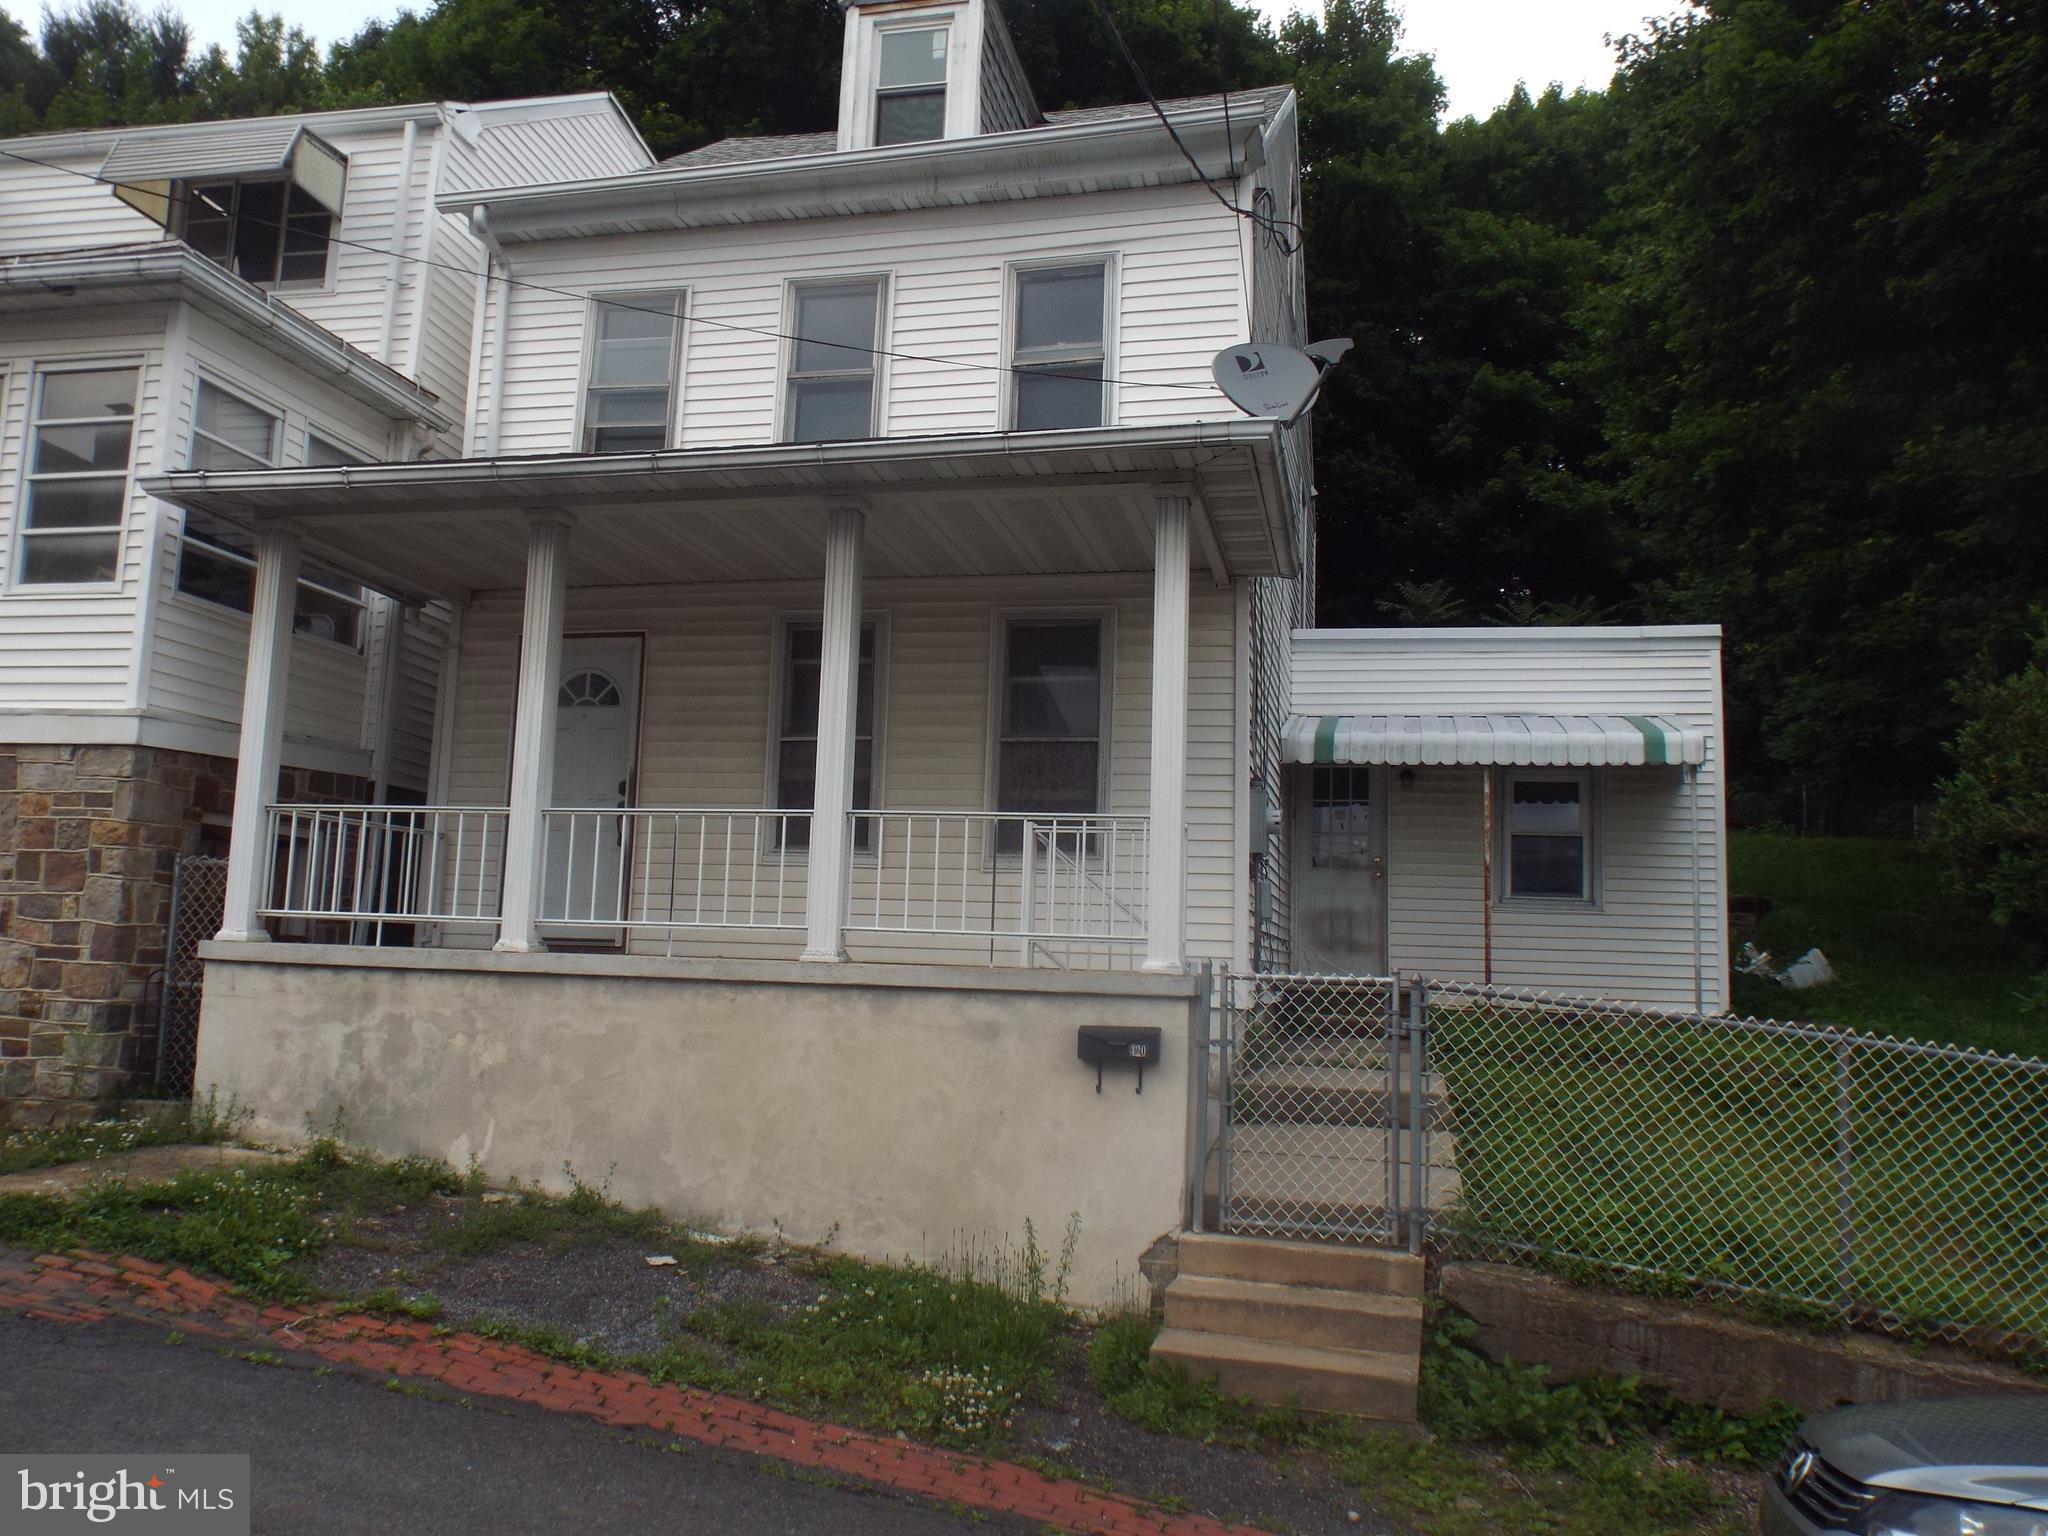 418-420 PLEASANT STREET, MINERSVILLE, PA 17954